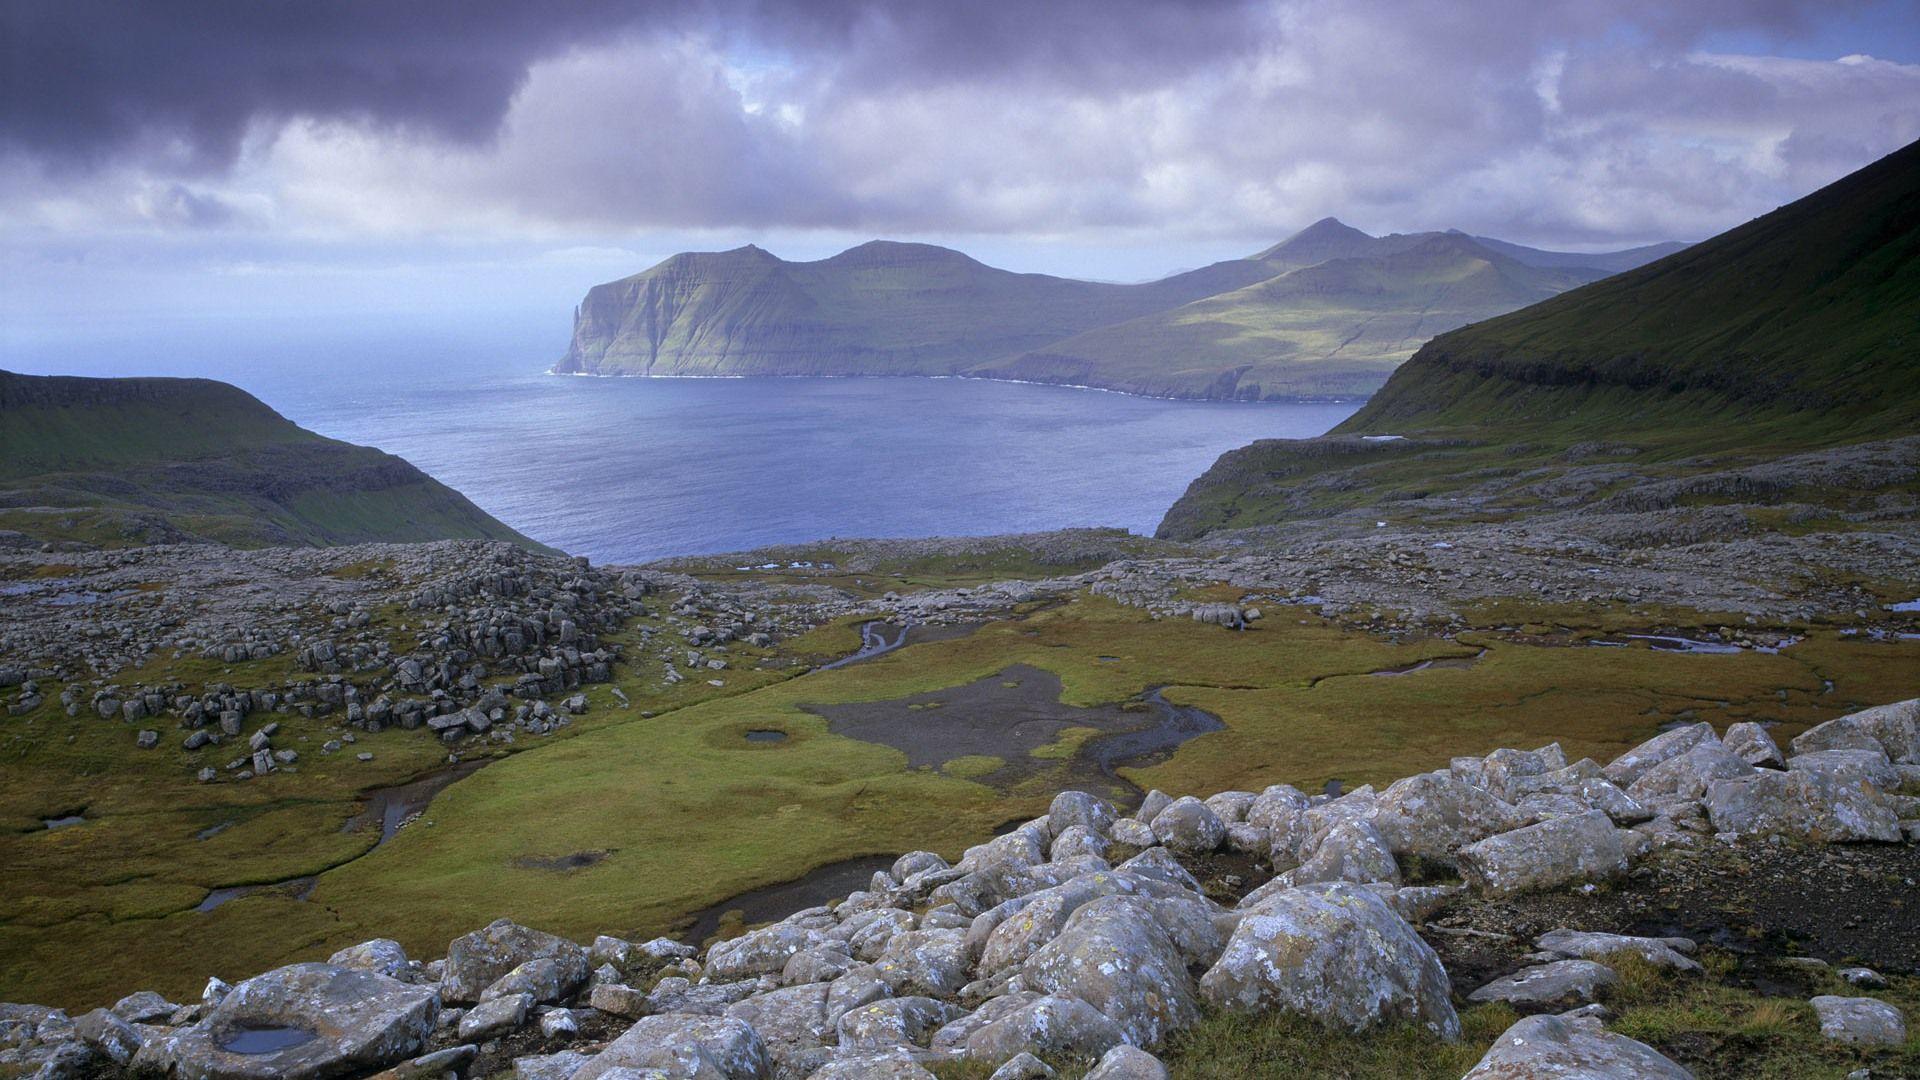 Nordic Landscape Wallpapers Top Free Nordic Landscape Backgrounds